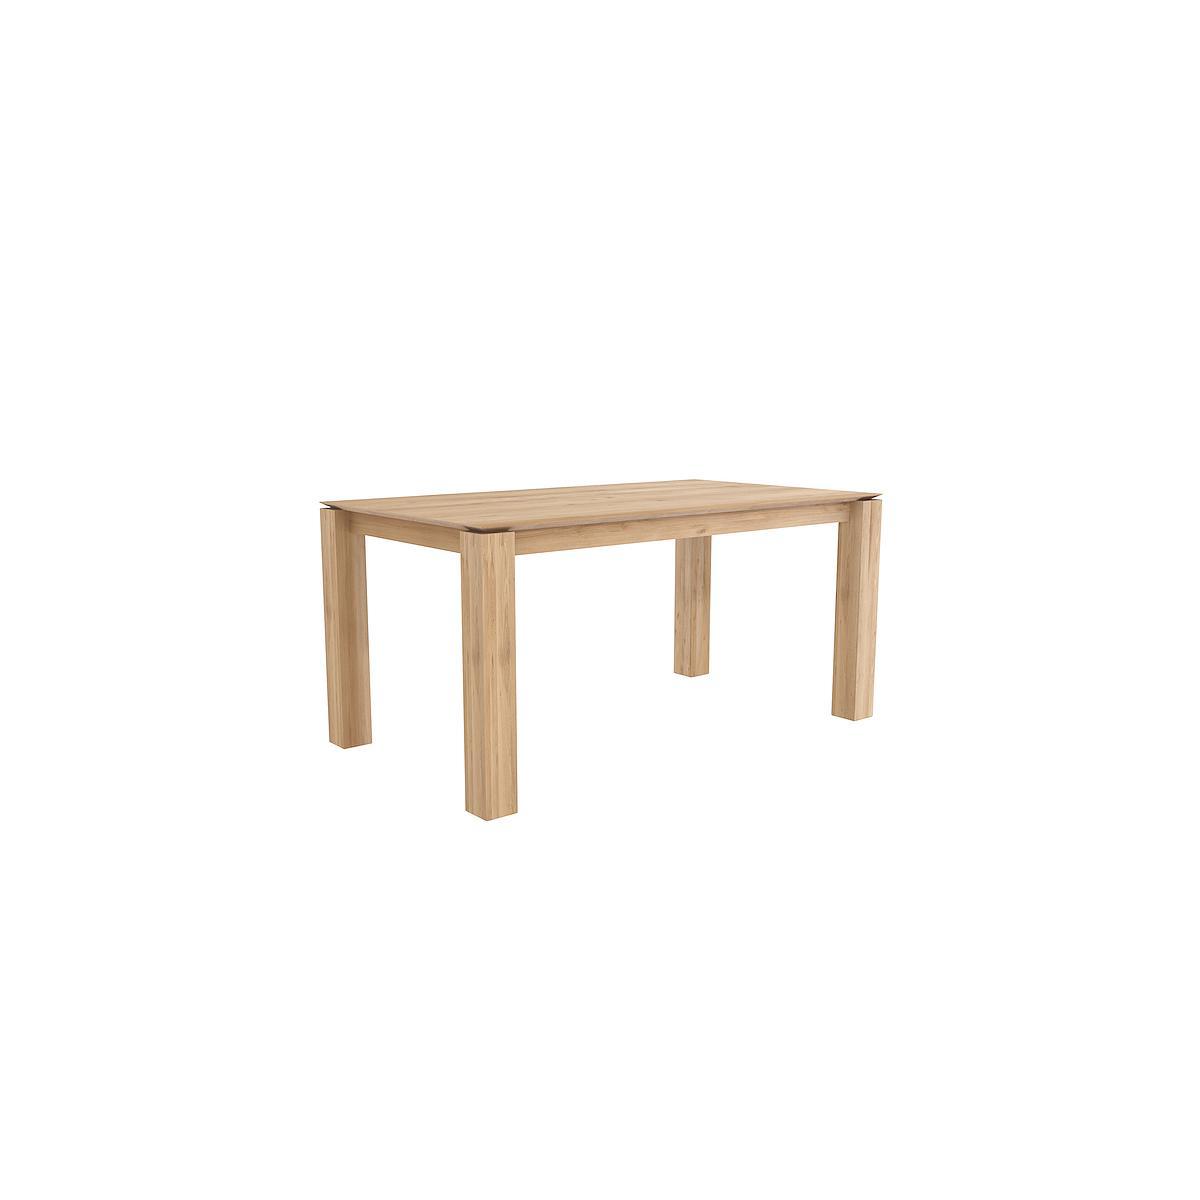 SLICE by  Ethnicraft Table chêne 90x160 cm